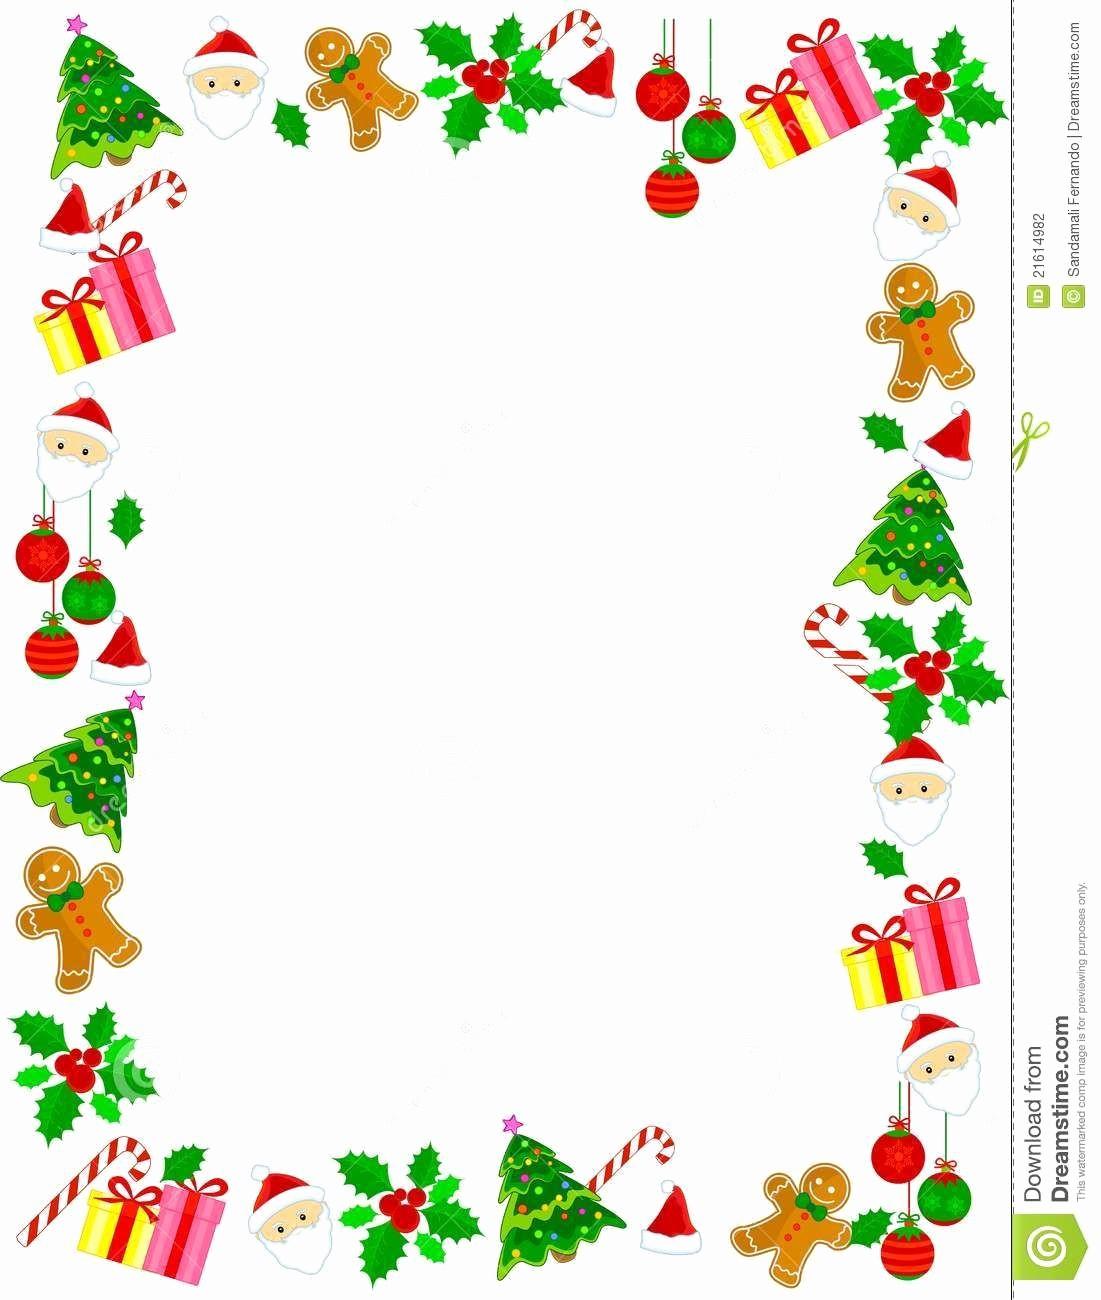 Festive Borders for Word Document Best Of Christmas Border Frame Download From Over 50 Million